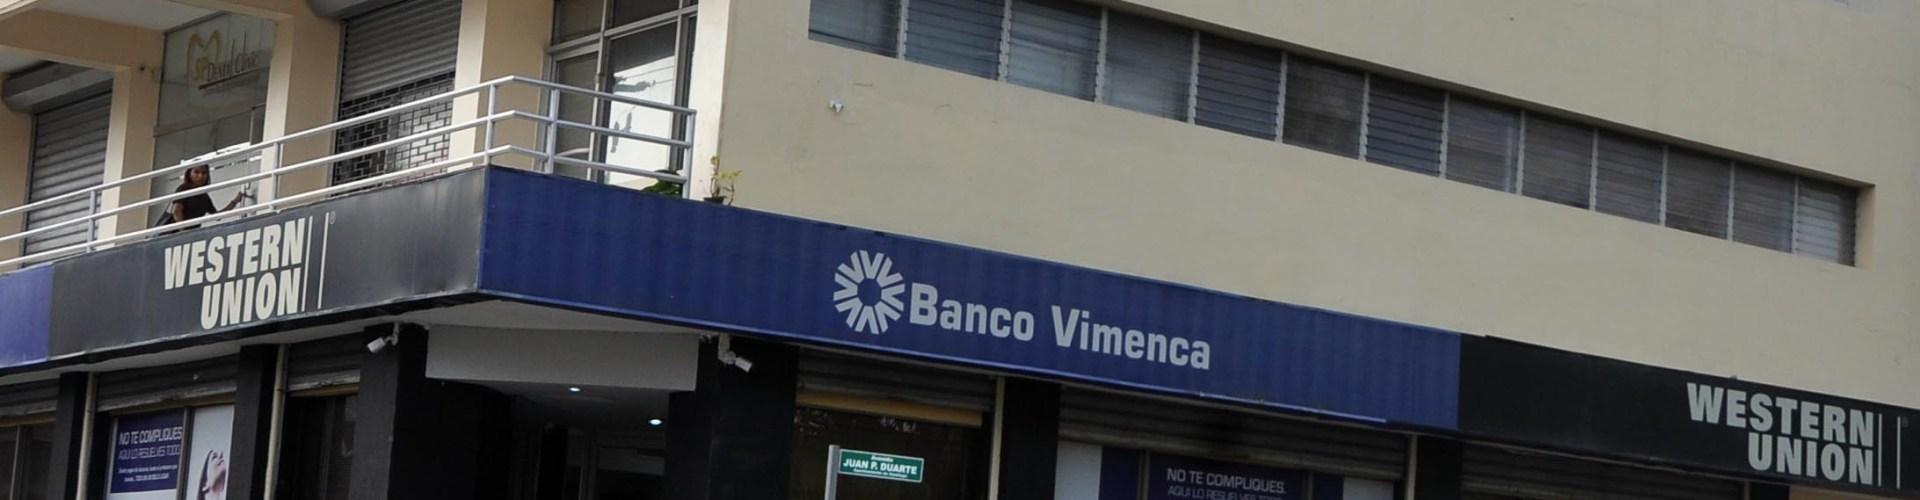 Realizan asalto millonario en Banco Vimenca